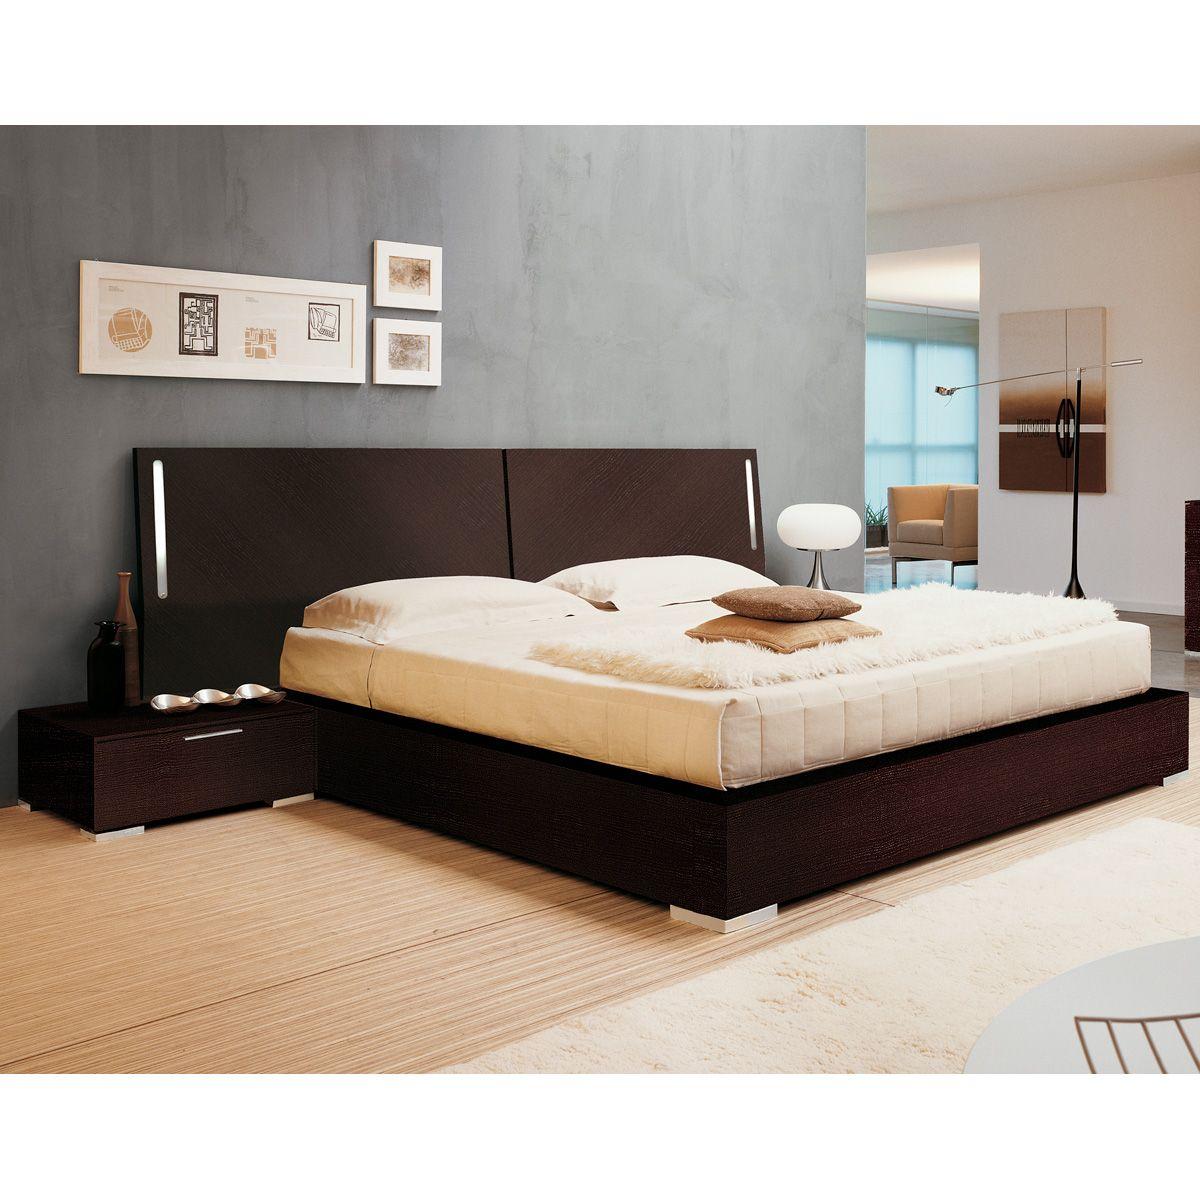 Best Enter Bed With Nightstands Bed Design Bedroom Sets 640 x 480